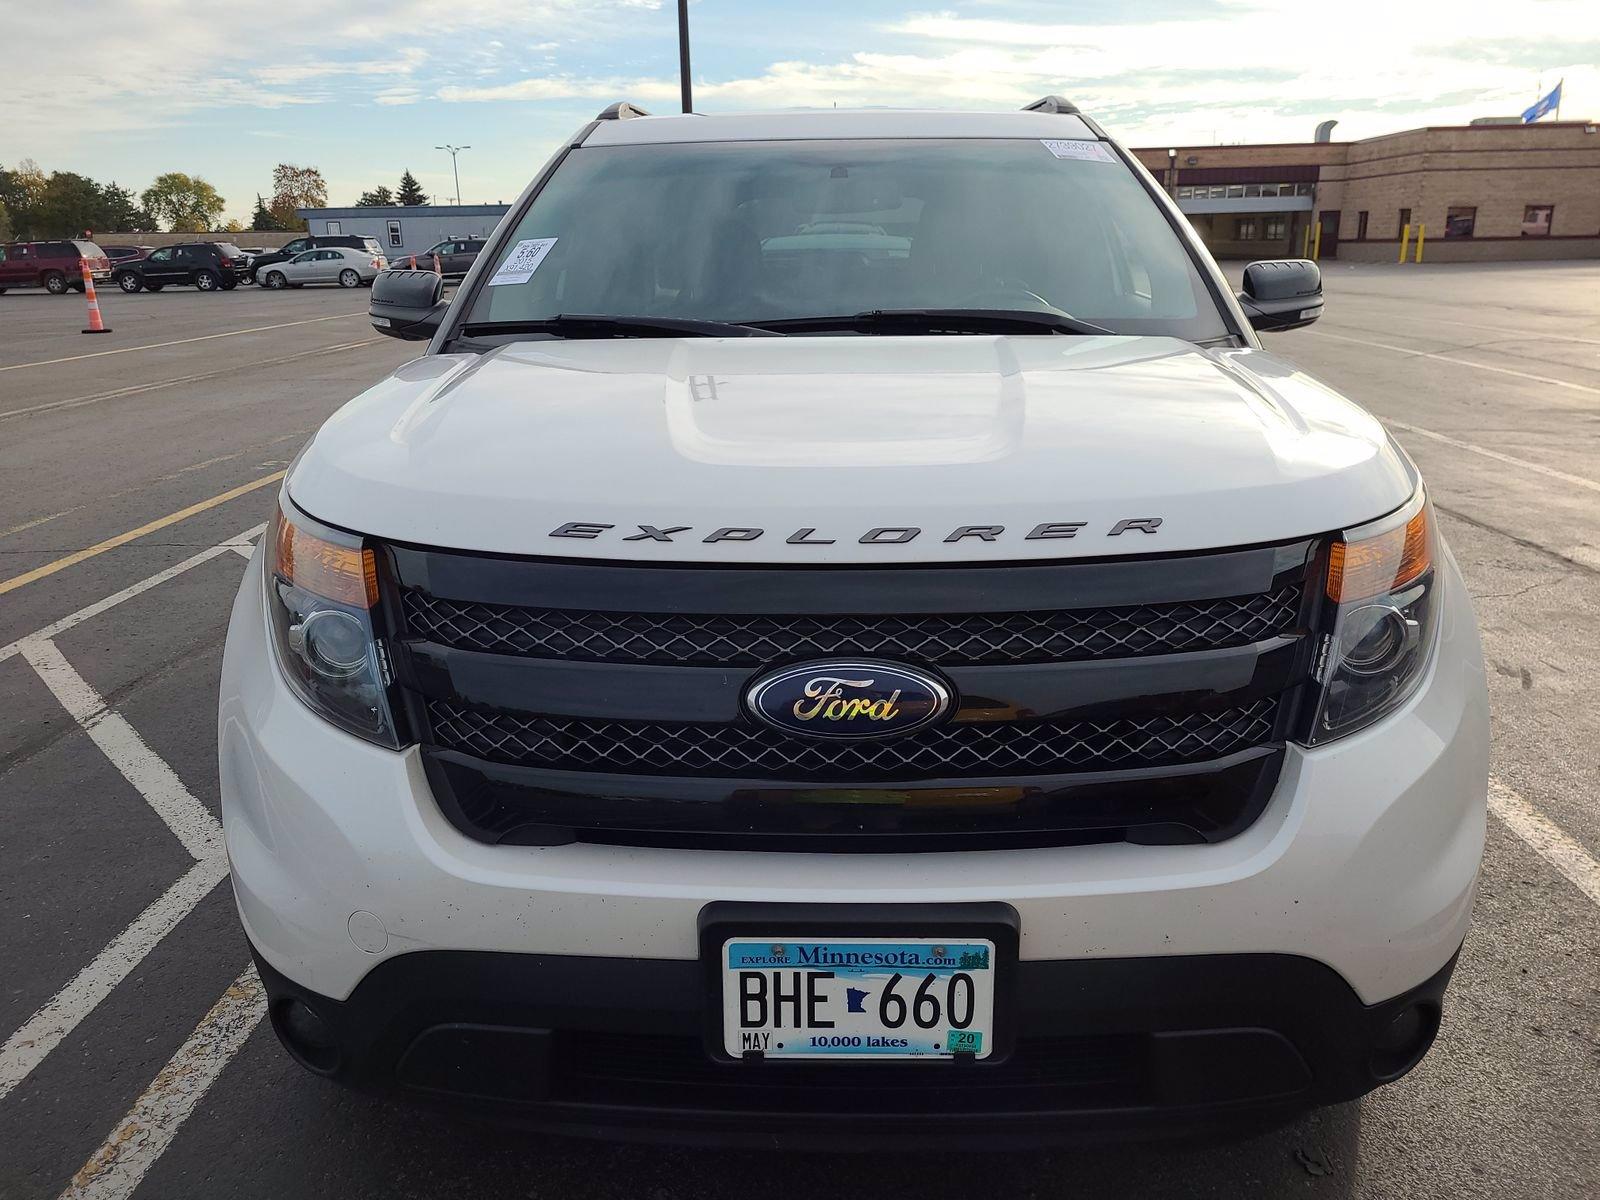 Used 2015 Ford Explorer Sport with VIN 1FM5K8GT8FGA68864 for sale in Saint Cloud, Minnesota